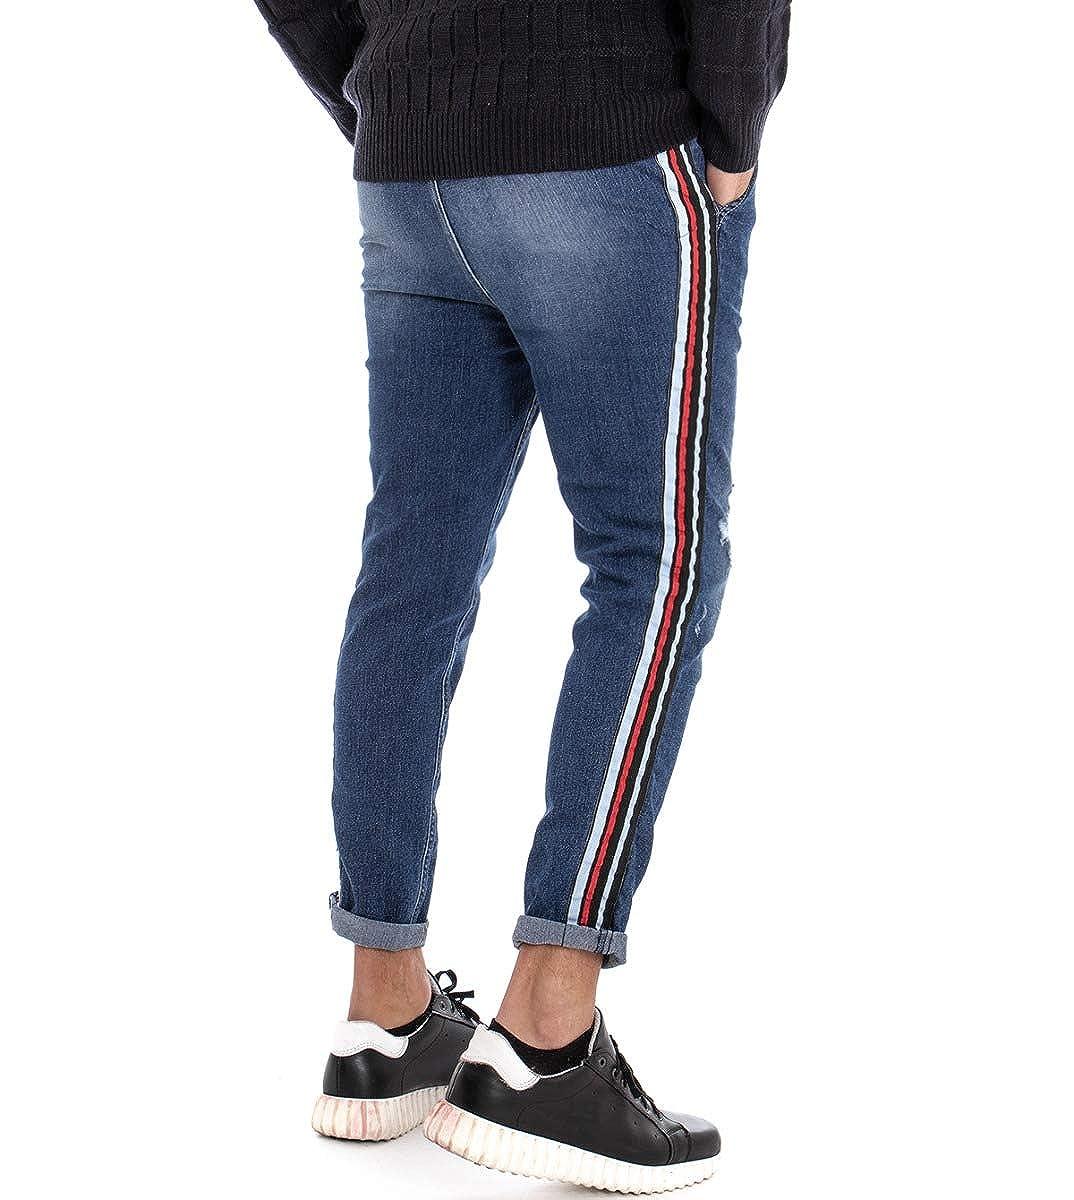 Giosal Completo Uomo Outfit Giubbotto Bomber Rosso Panta